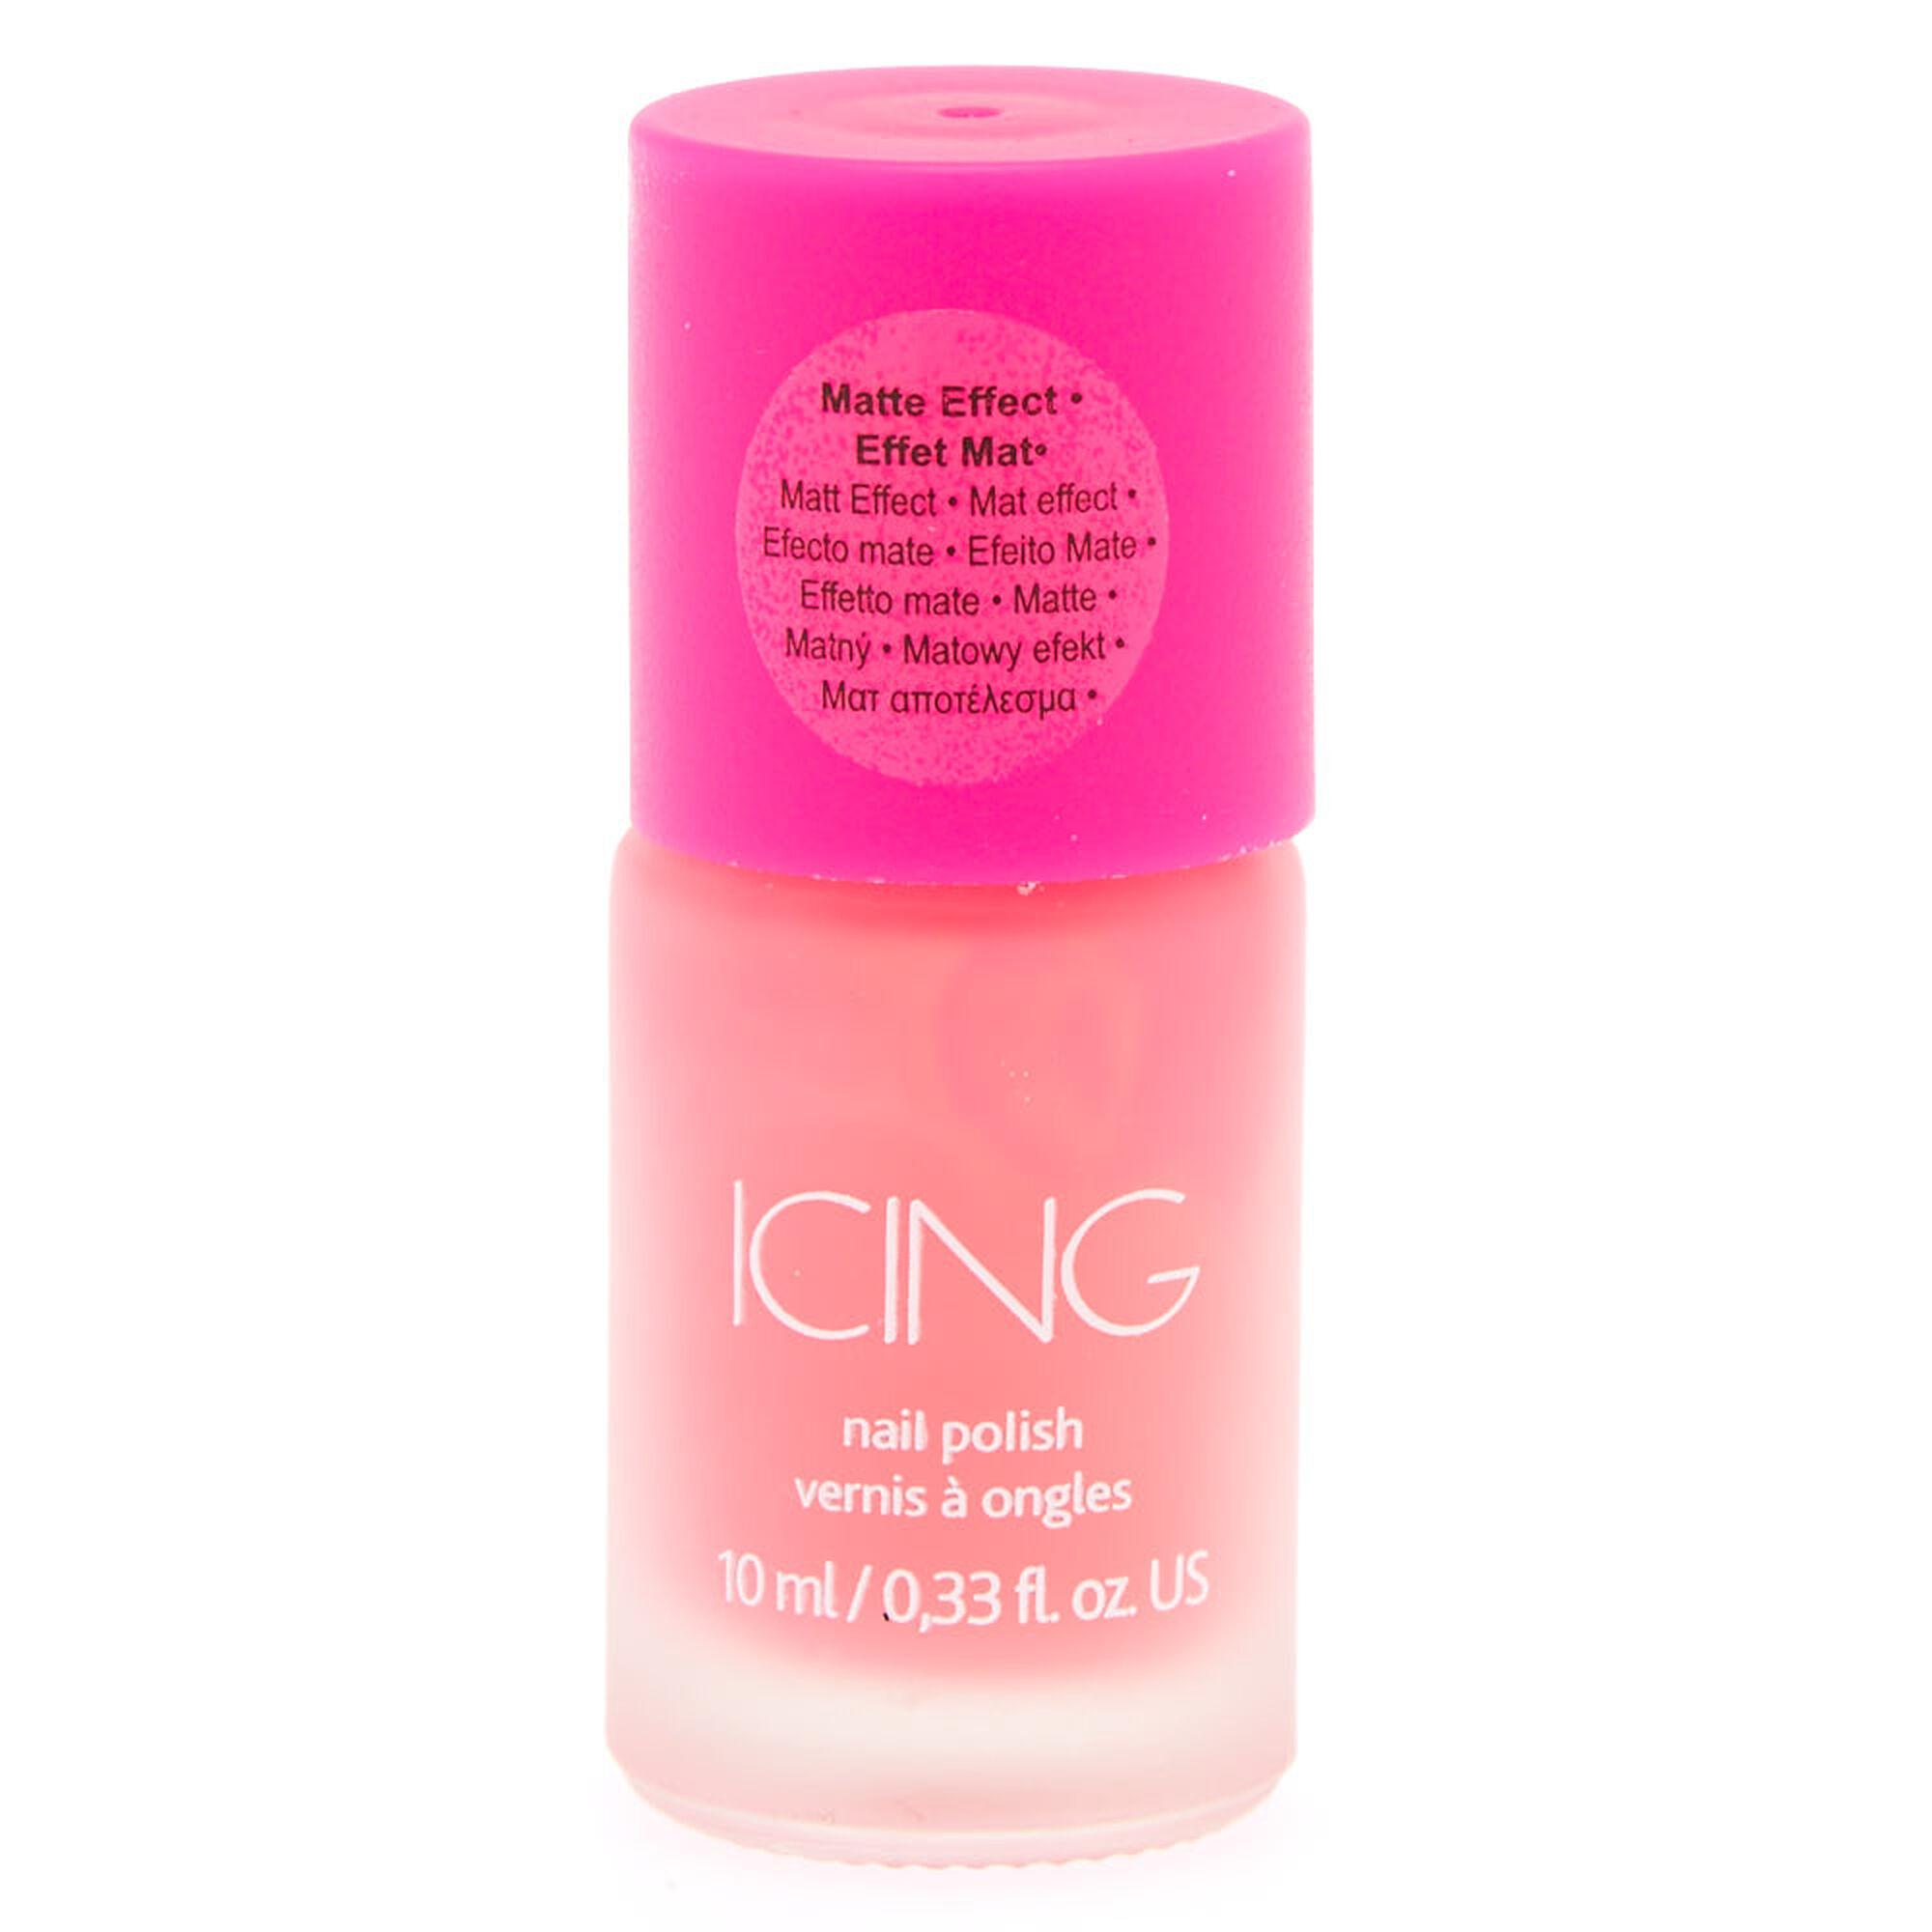 Pink Matte Nail Polish | Icing US